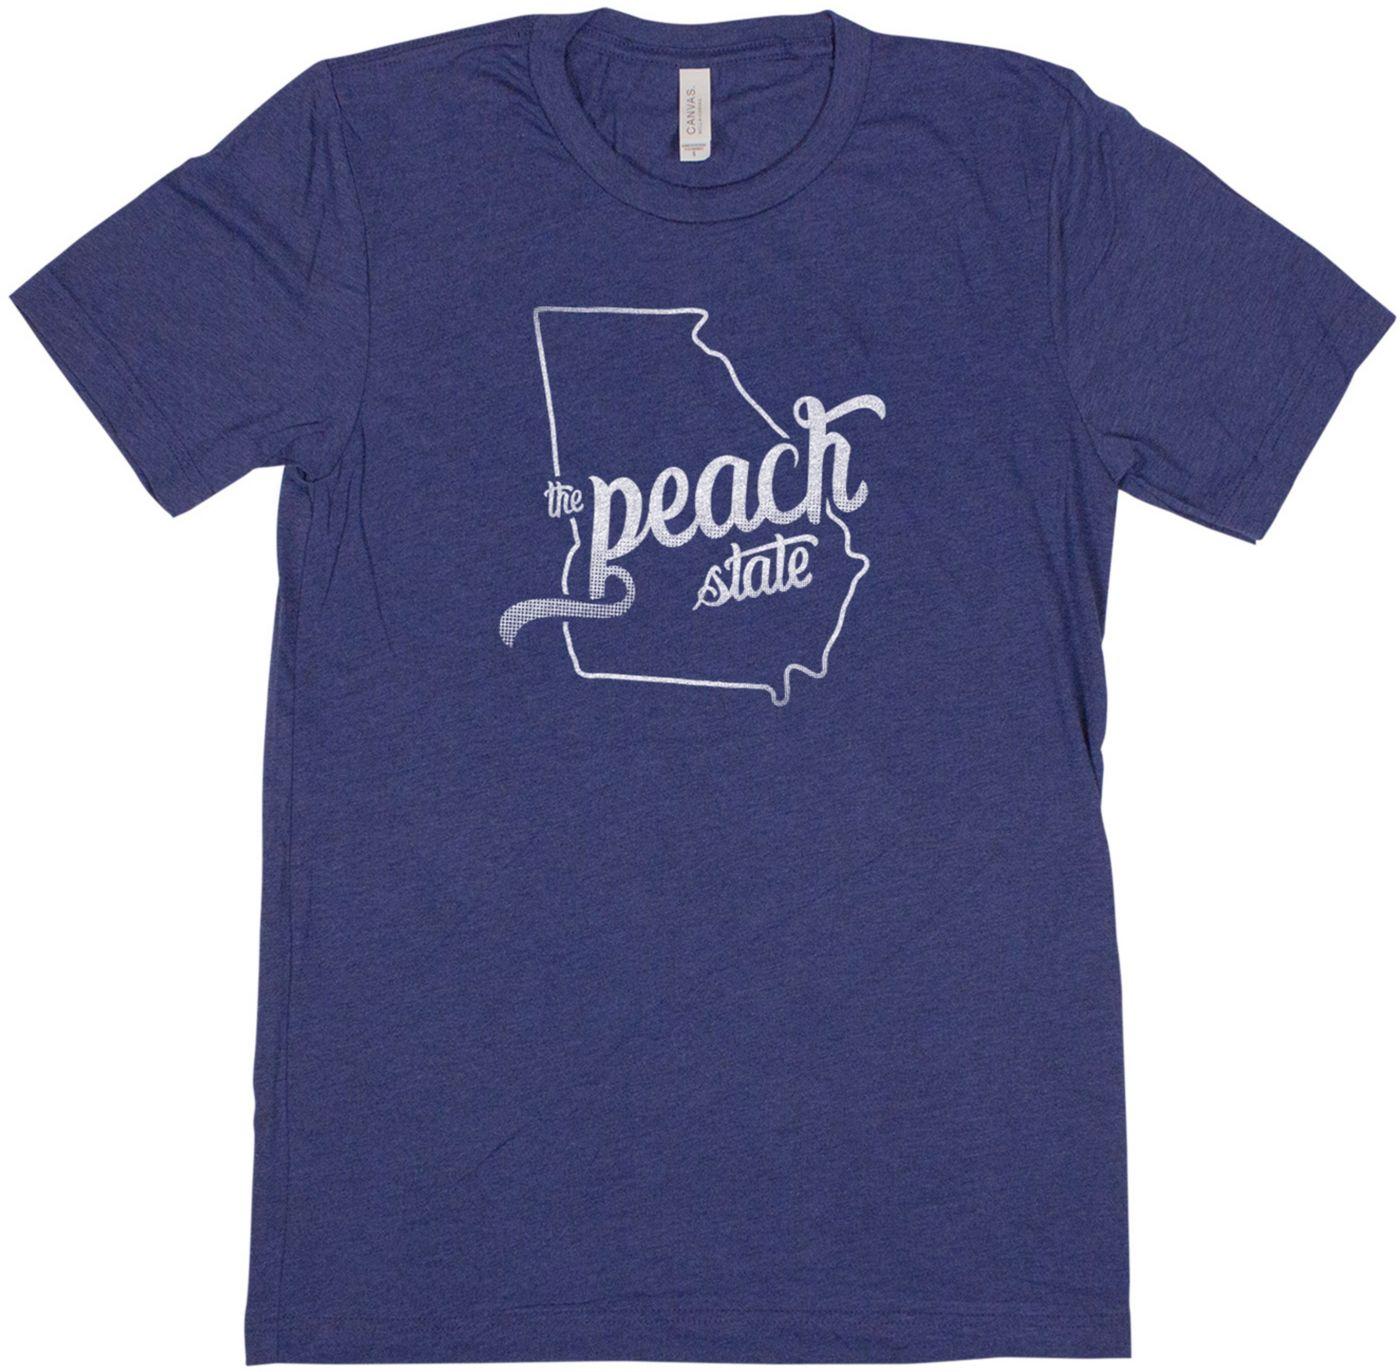 Home State Apparel Women's Georgia Freehand Short Sleeve T-Shirt